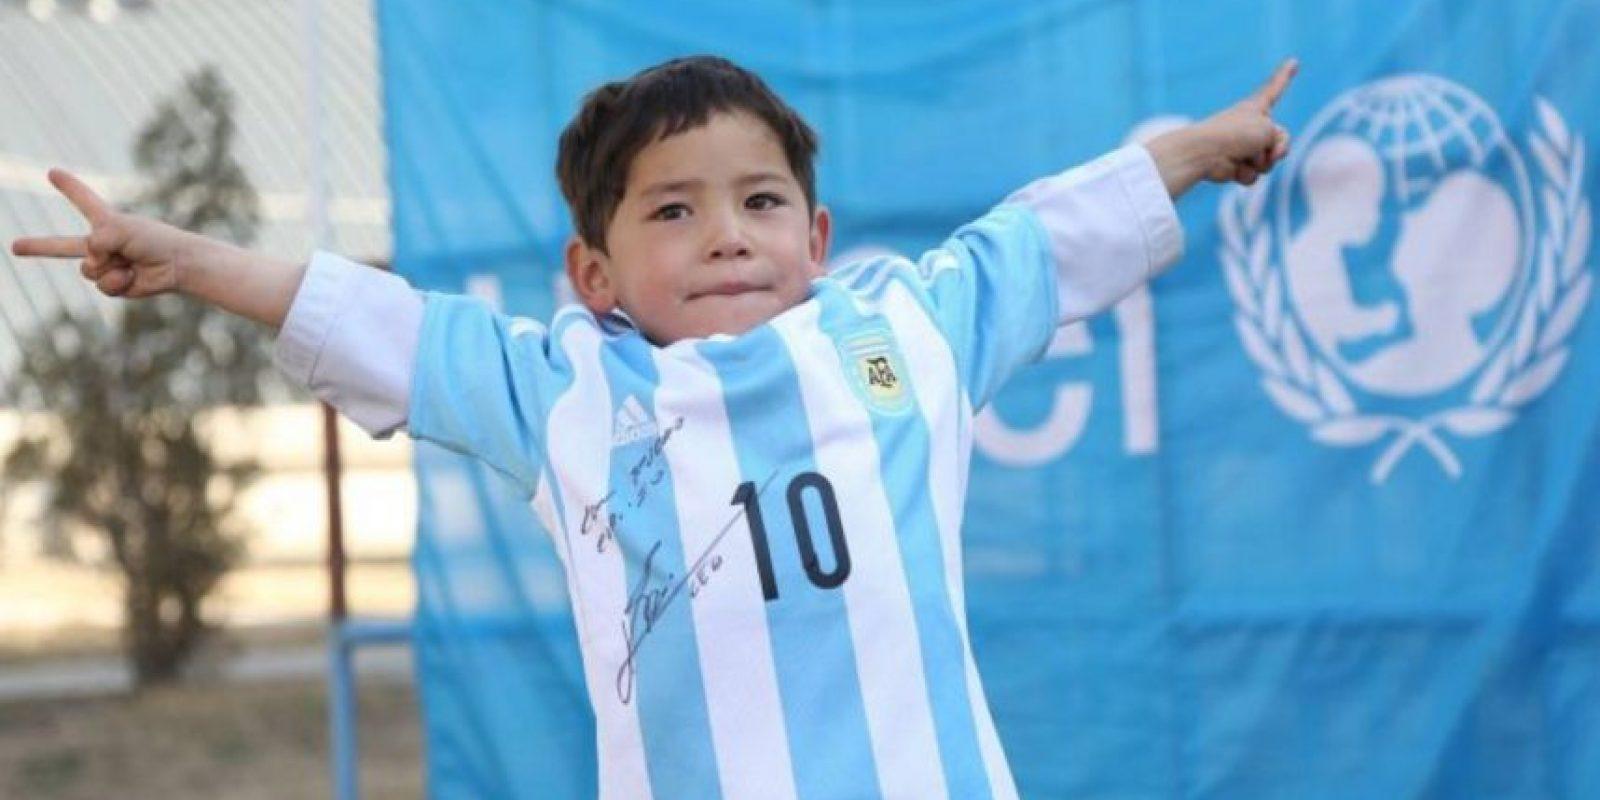 Lionel Messi le envió una camiseta firmada Foto:facebook.com/afghanistanunicef/